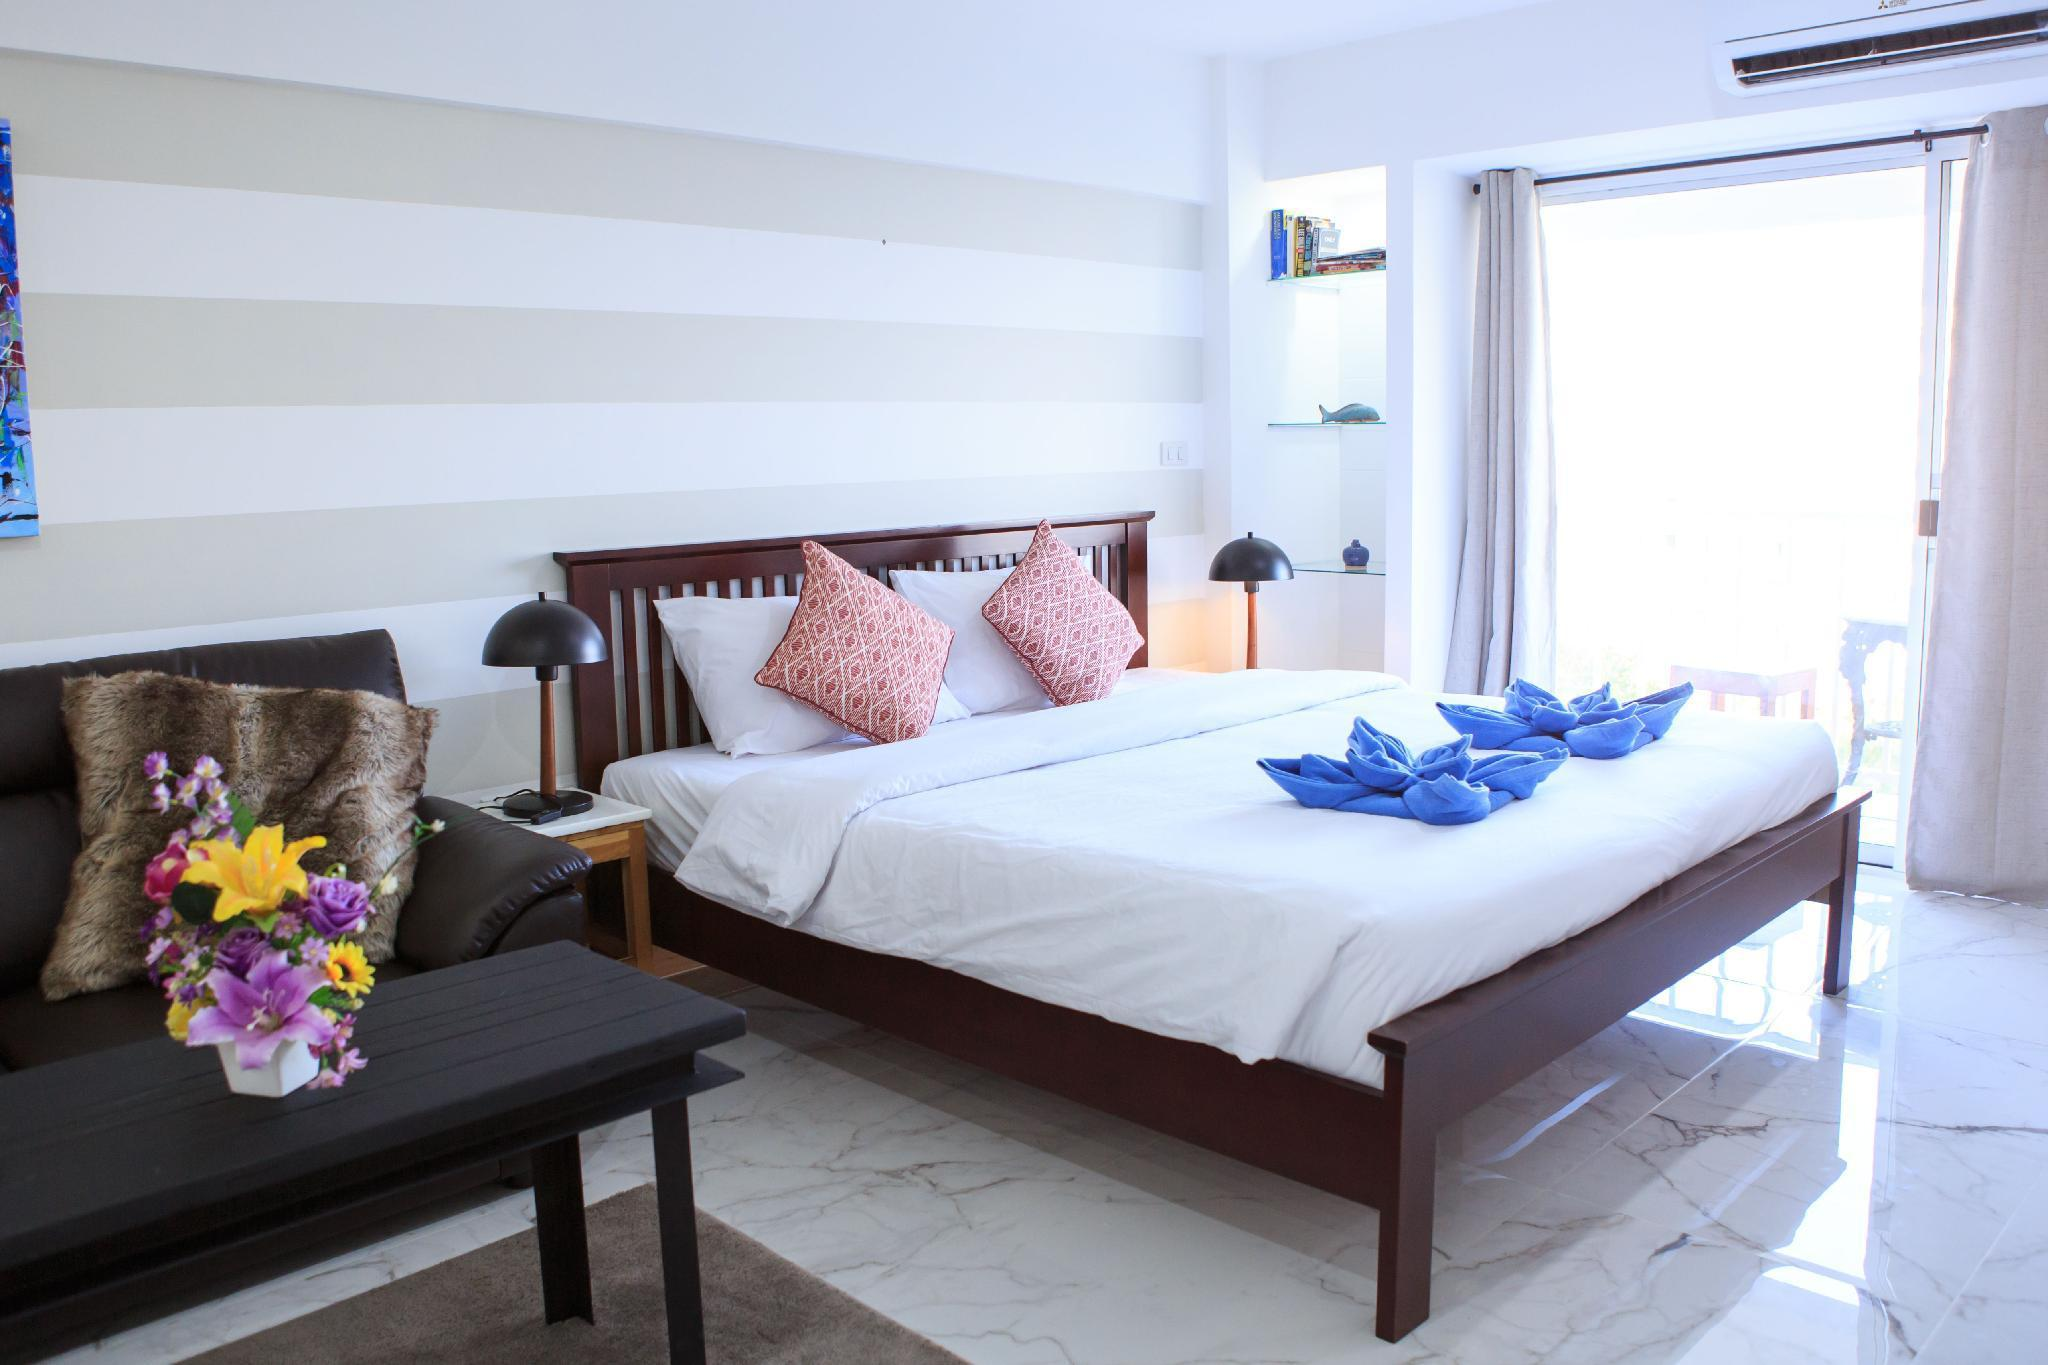 Bright & Modern Couples Retreat w/Amazing Views สตูดิโอ อพาร์ตเมนต์ 1 ห้องน้ำส่วนตัว ขนาด 37 ตร.ม. – นิมมานเหมินทร์